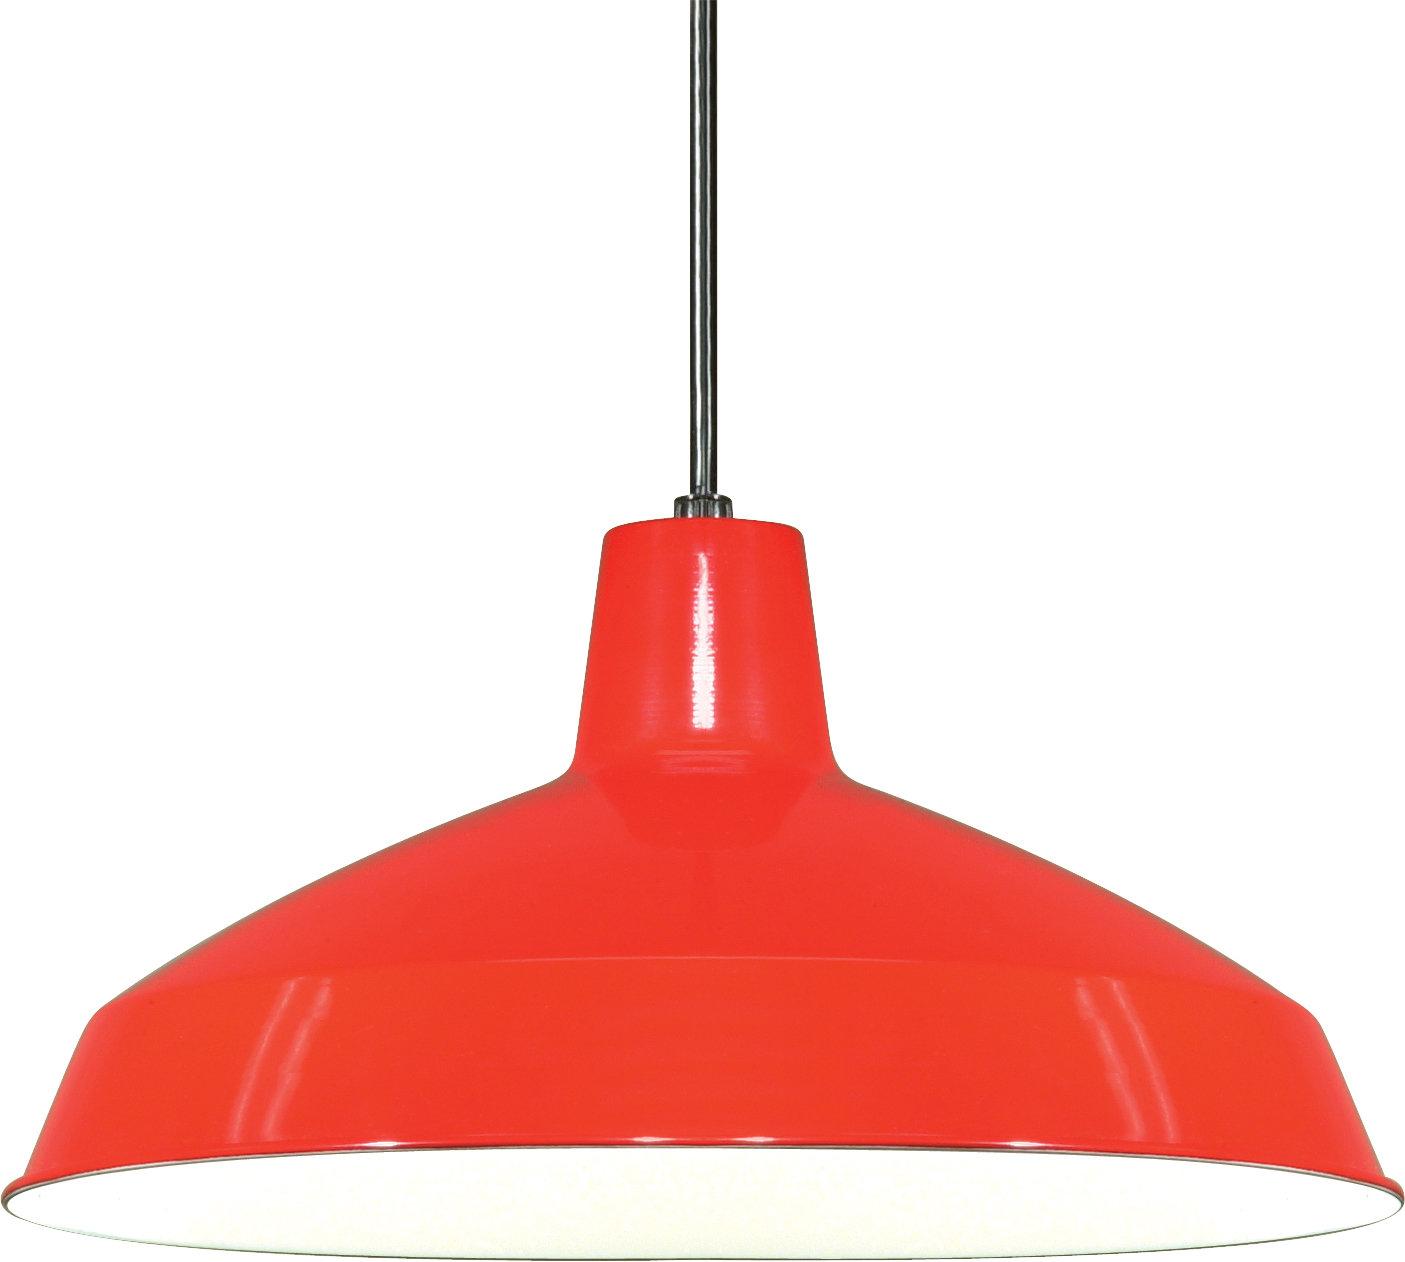 Gattis 1 Light Dome Pendant With Gattis 1 Light Dome Pendants (View 10 of 30)